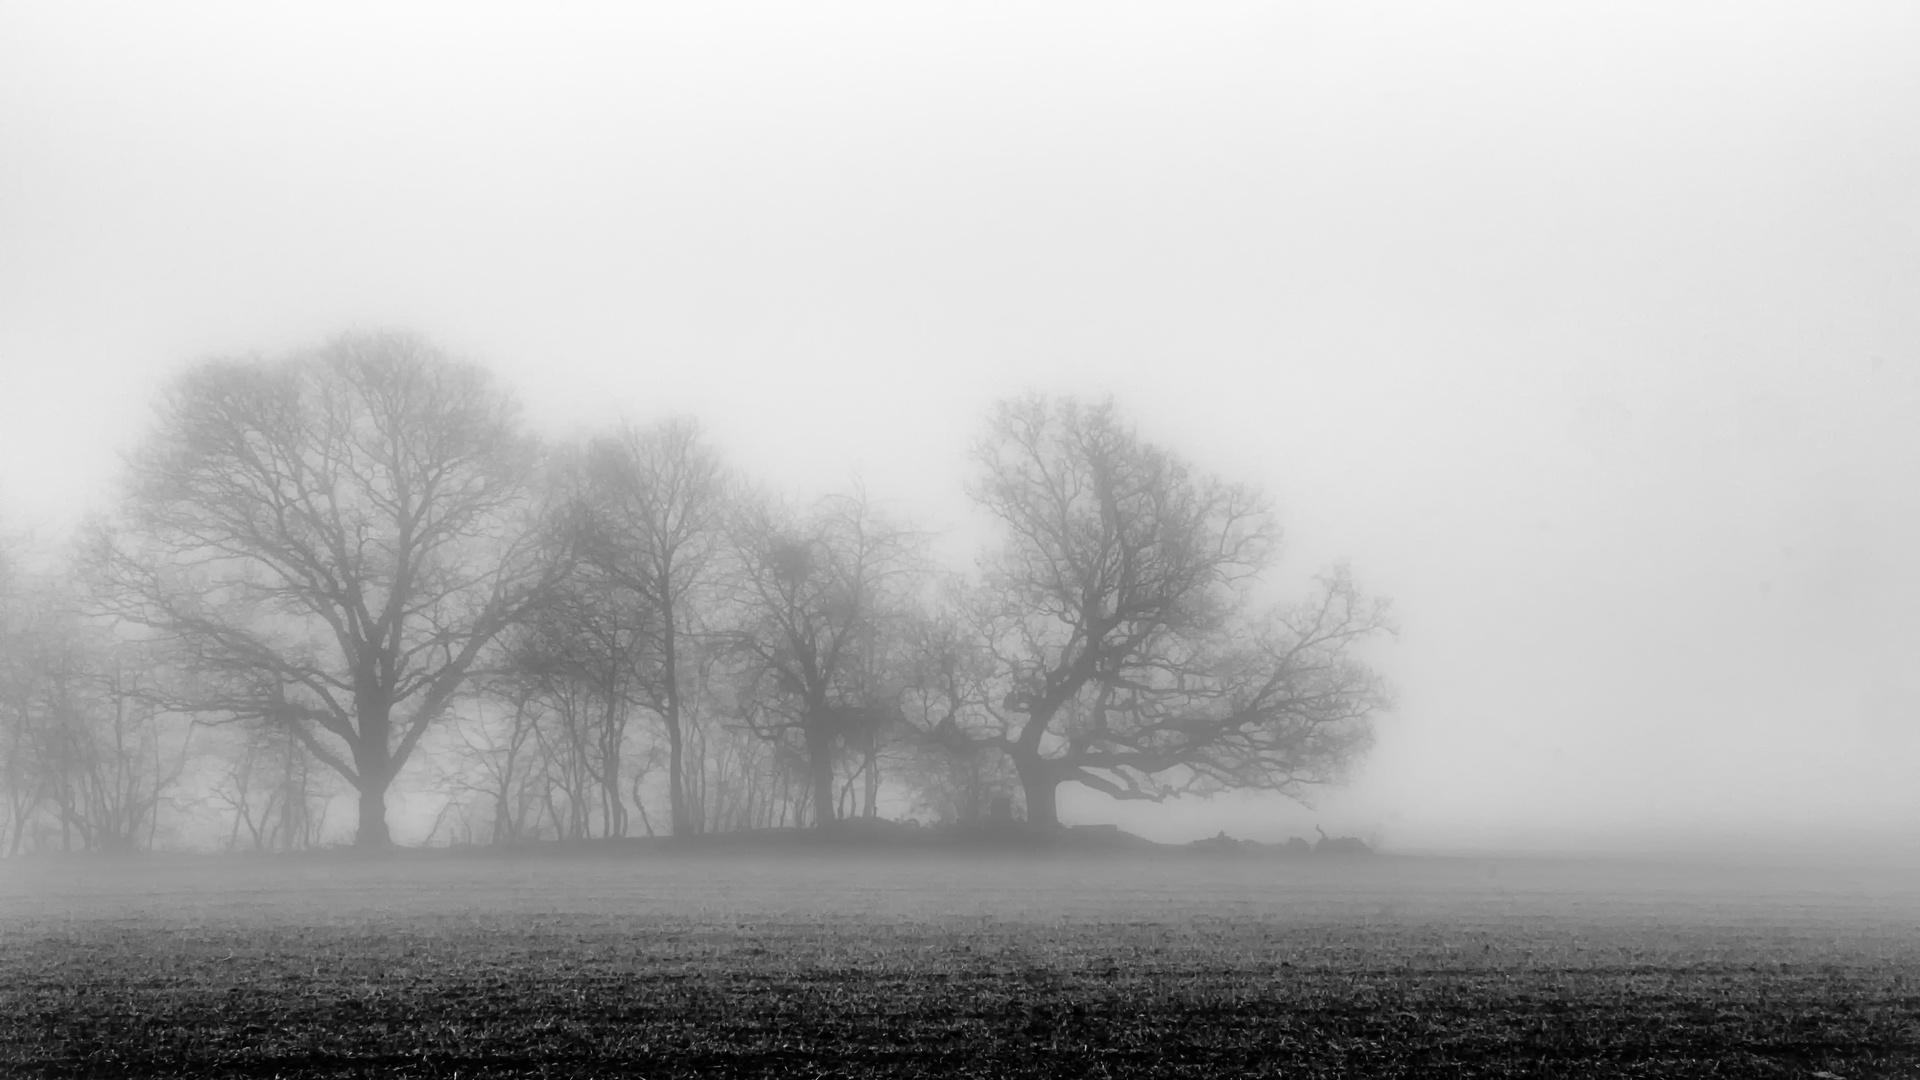 Baumgruppe im Winternebel